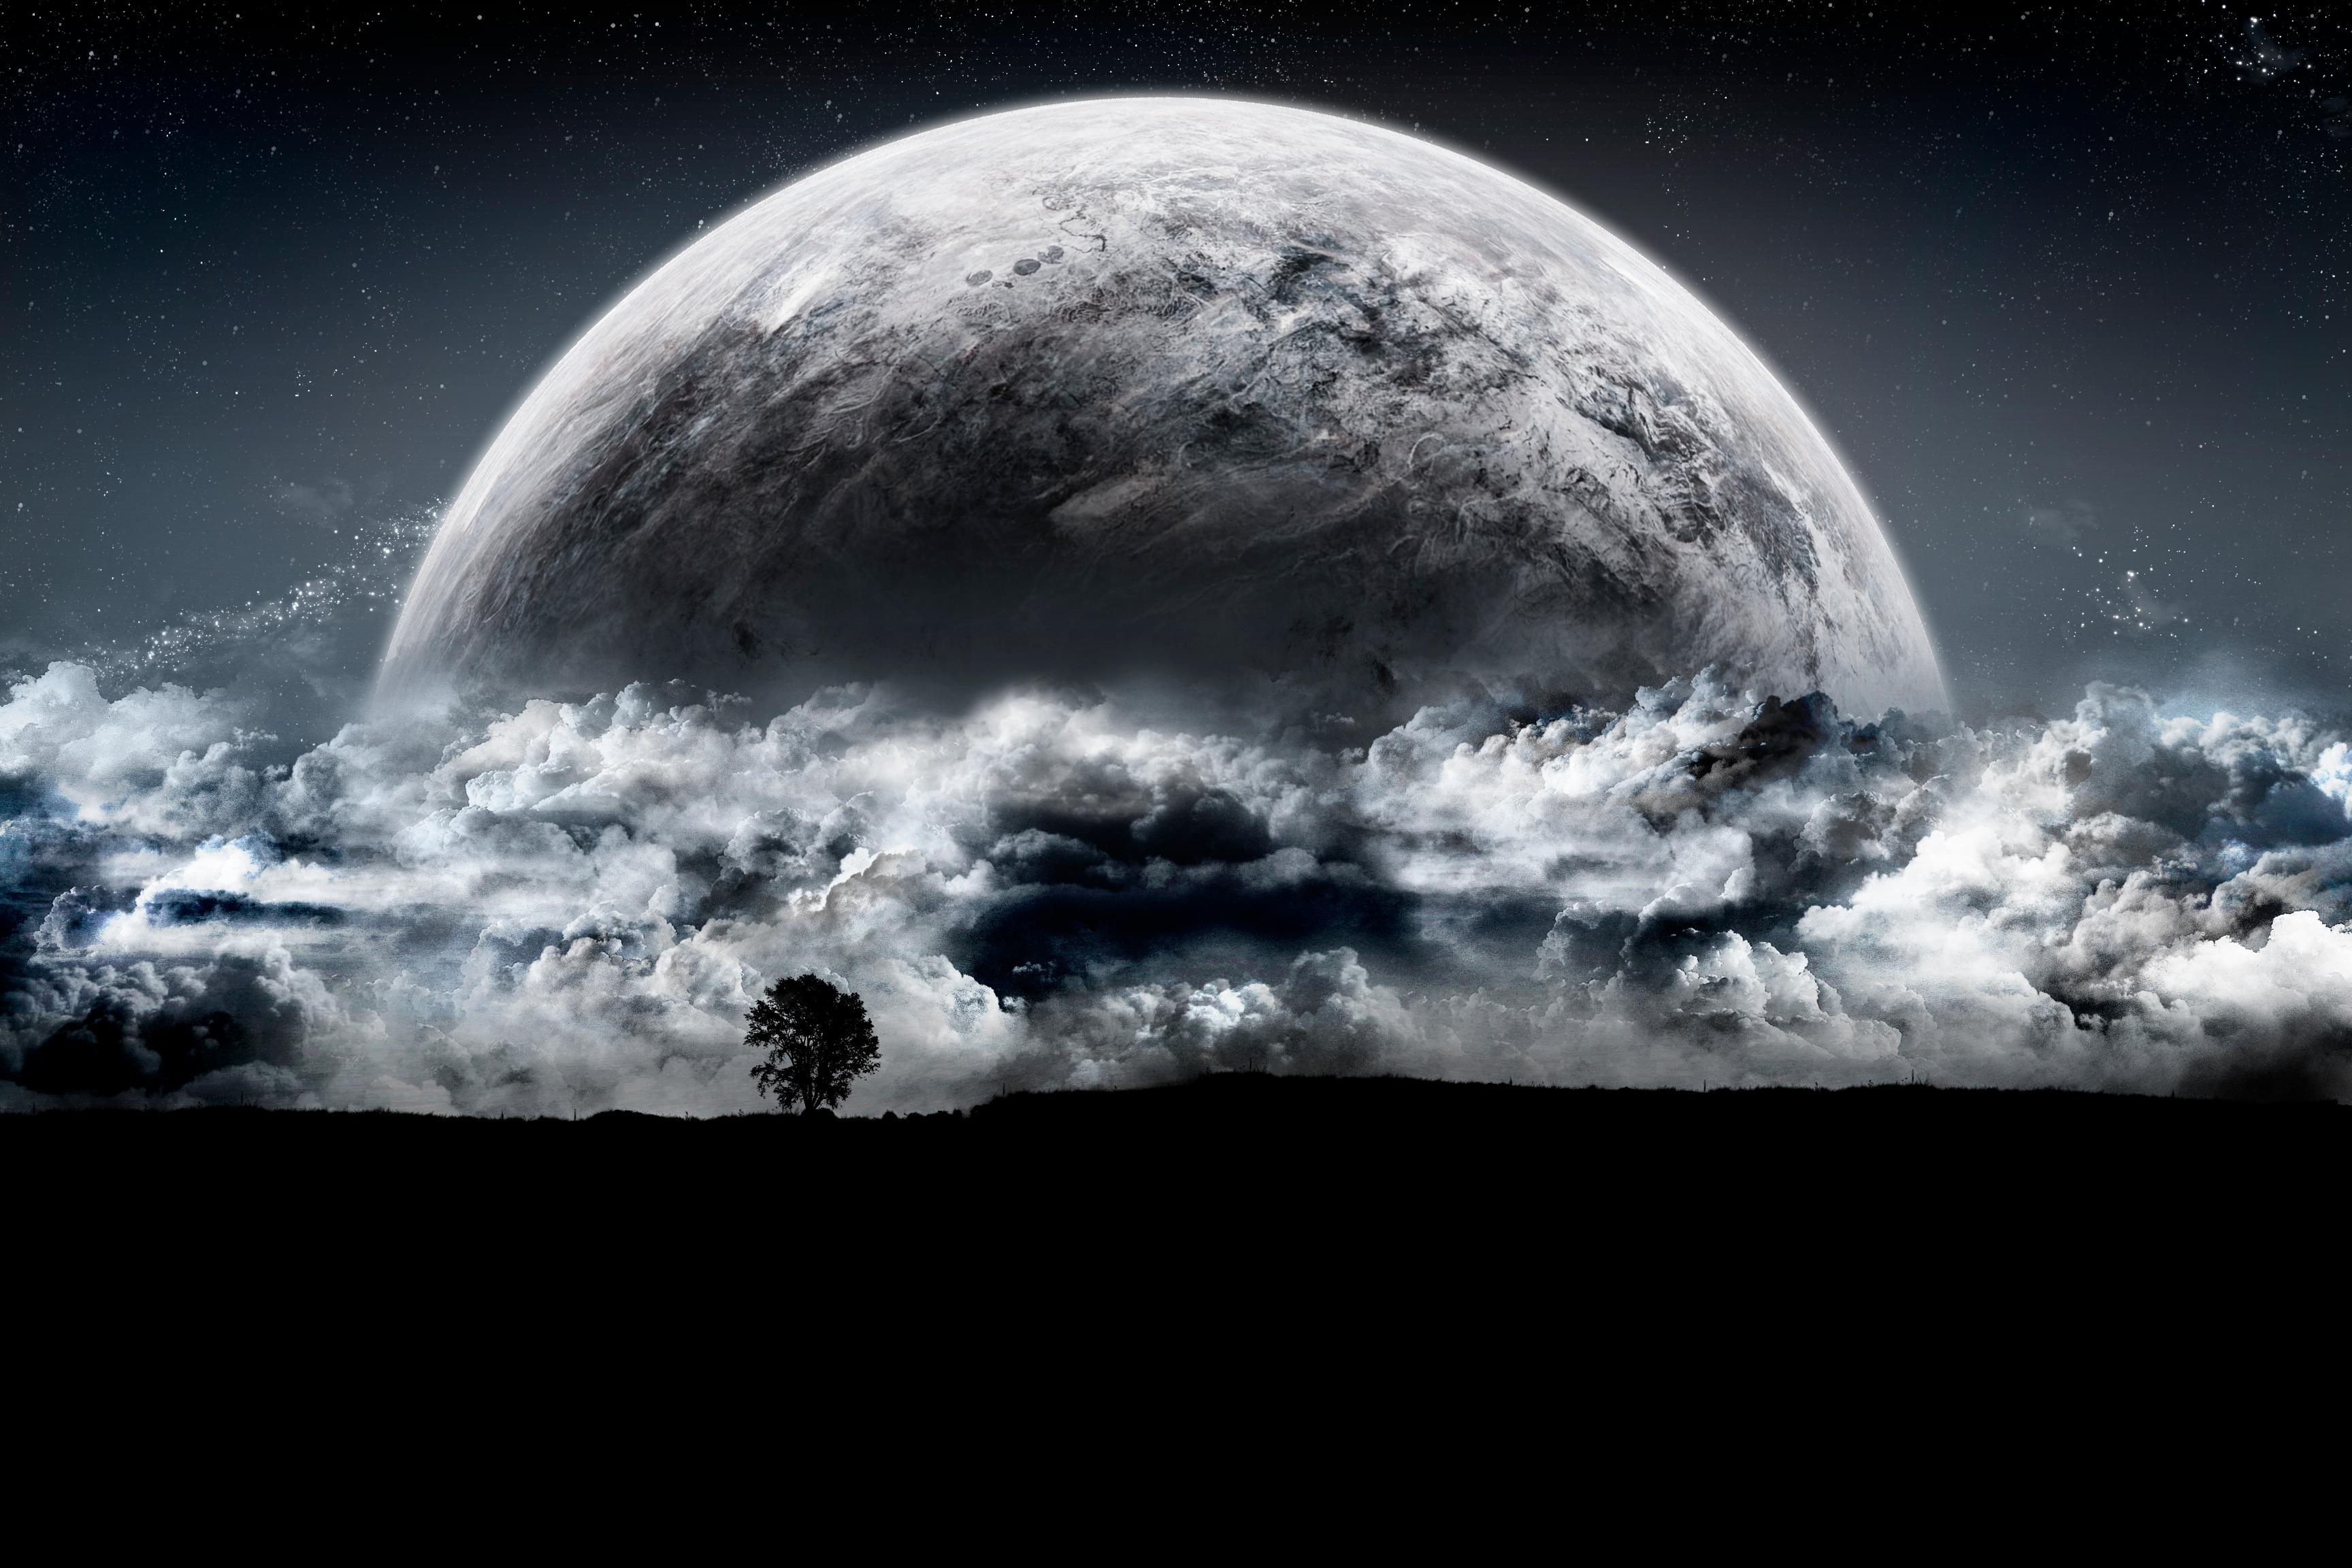 Moon Planet Planet Rise Sky 3456x2304